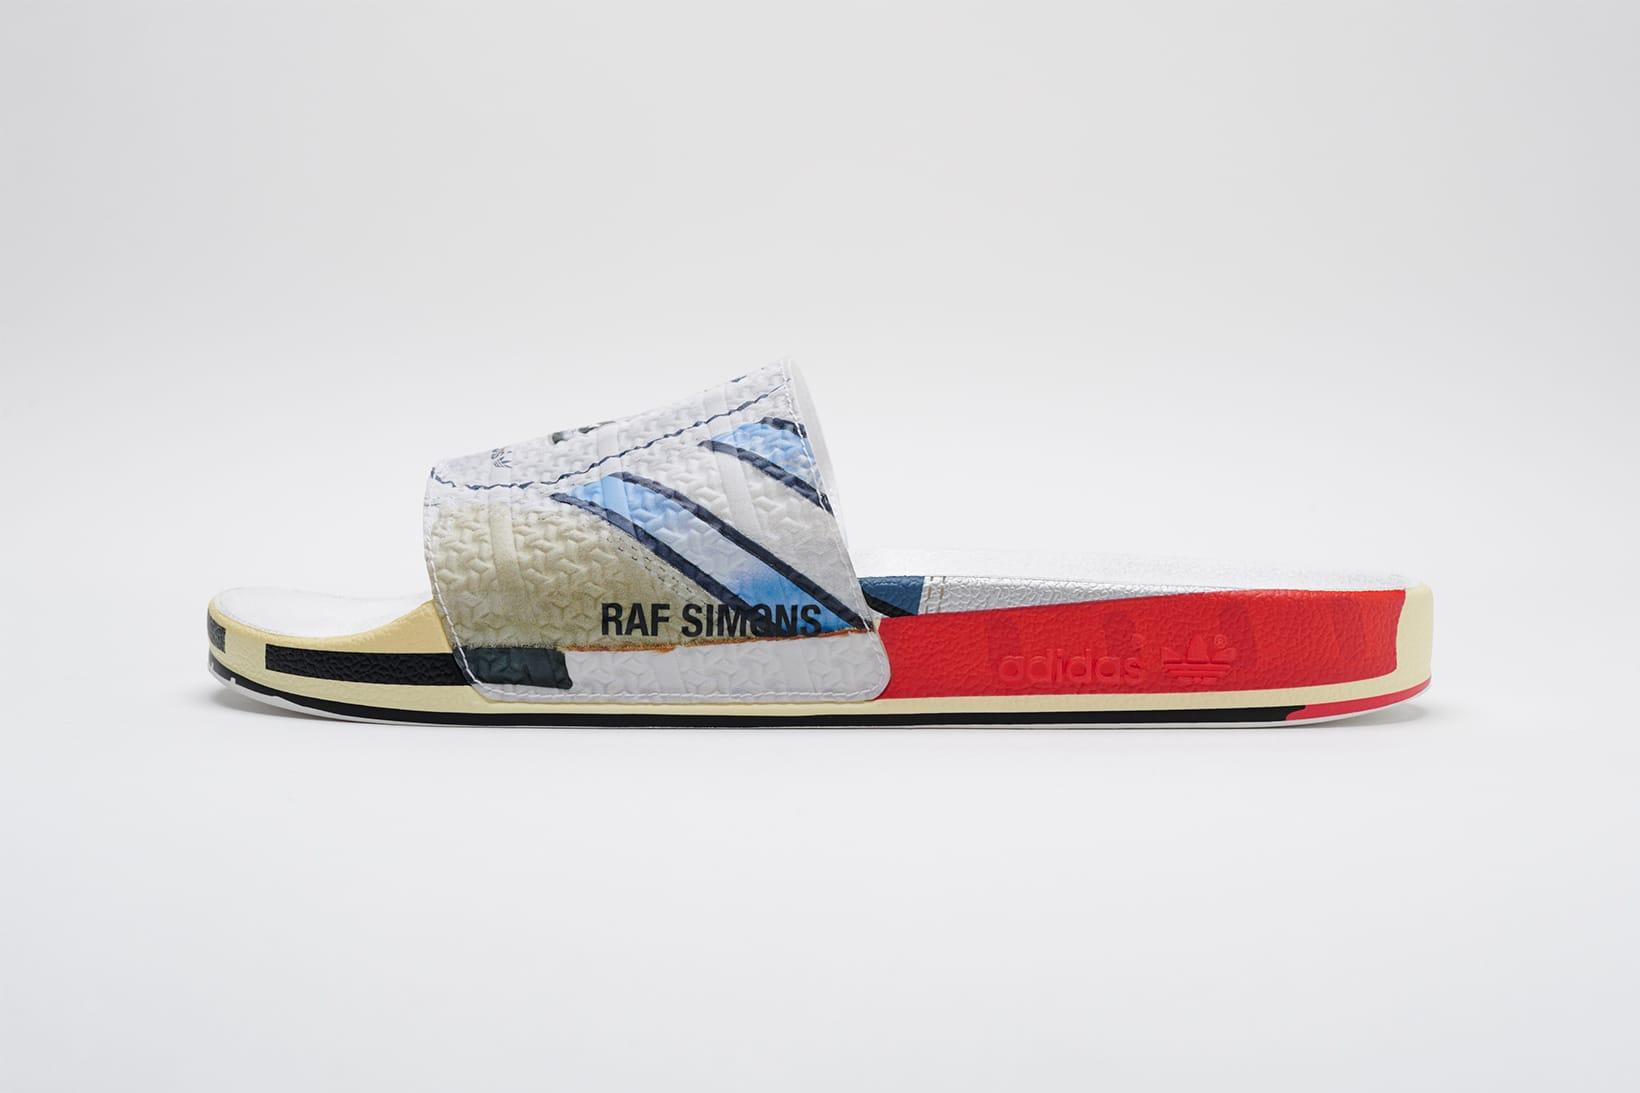 Raf Simons x adidas Adilette Slides